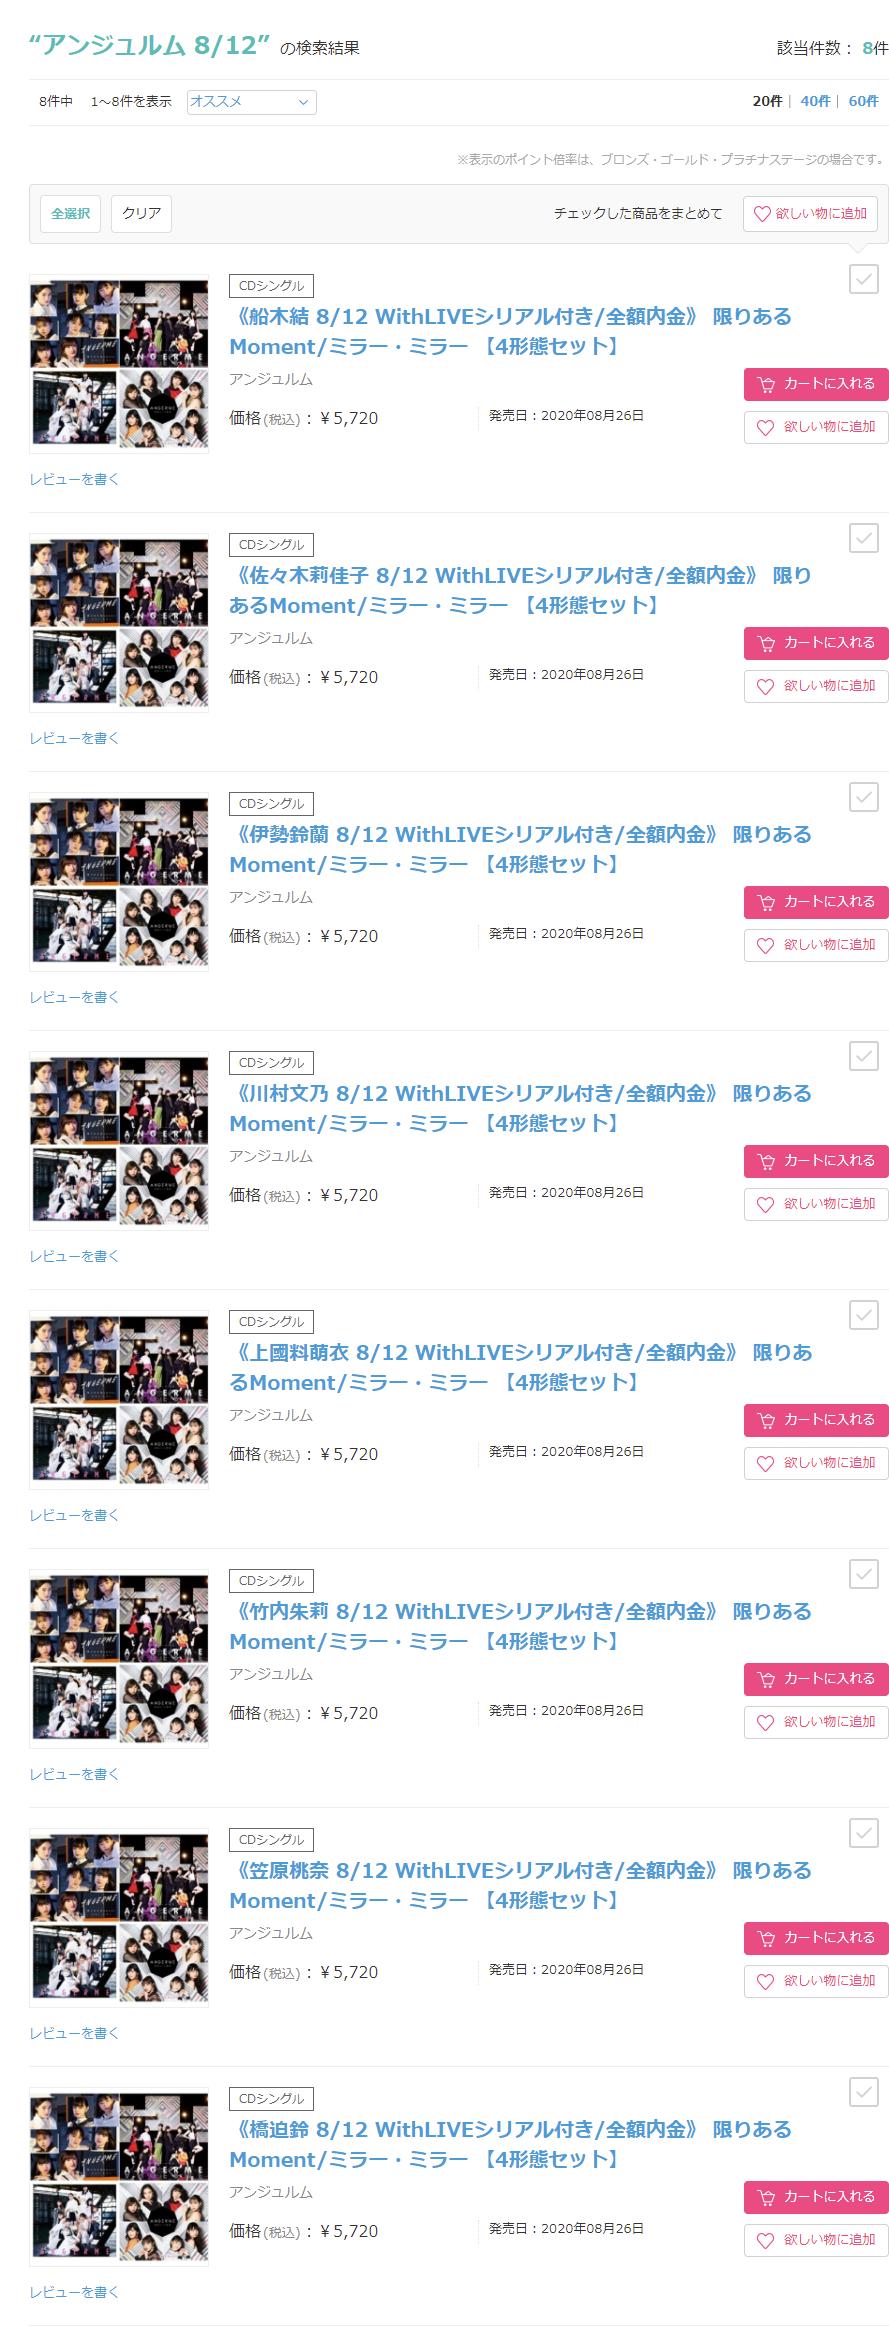 http://www.mybitchisajunky.com/whg/picture/screencapture-hmv-co-jp-search-keyword-8-12-target-ALL-type-sr-2020-08-04-06_19_06.png